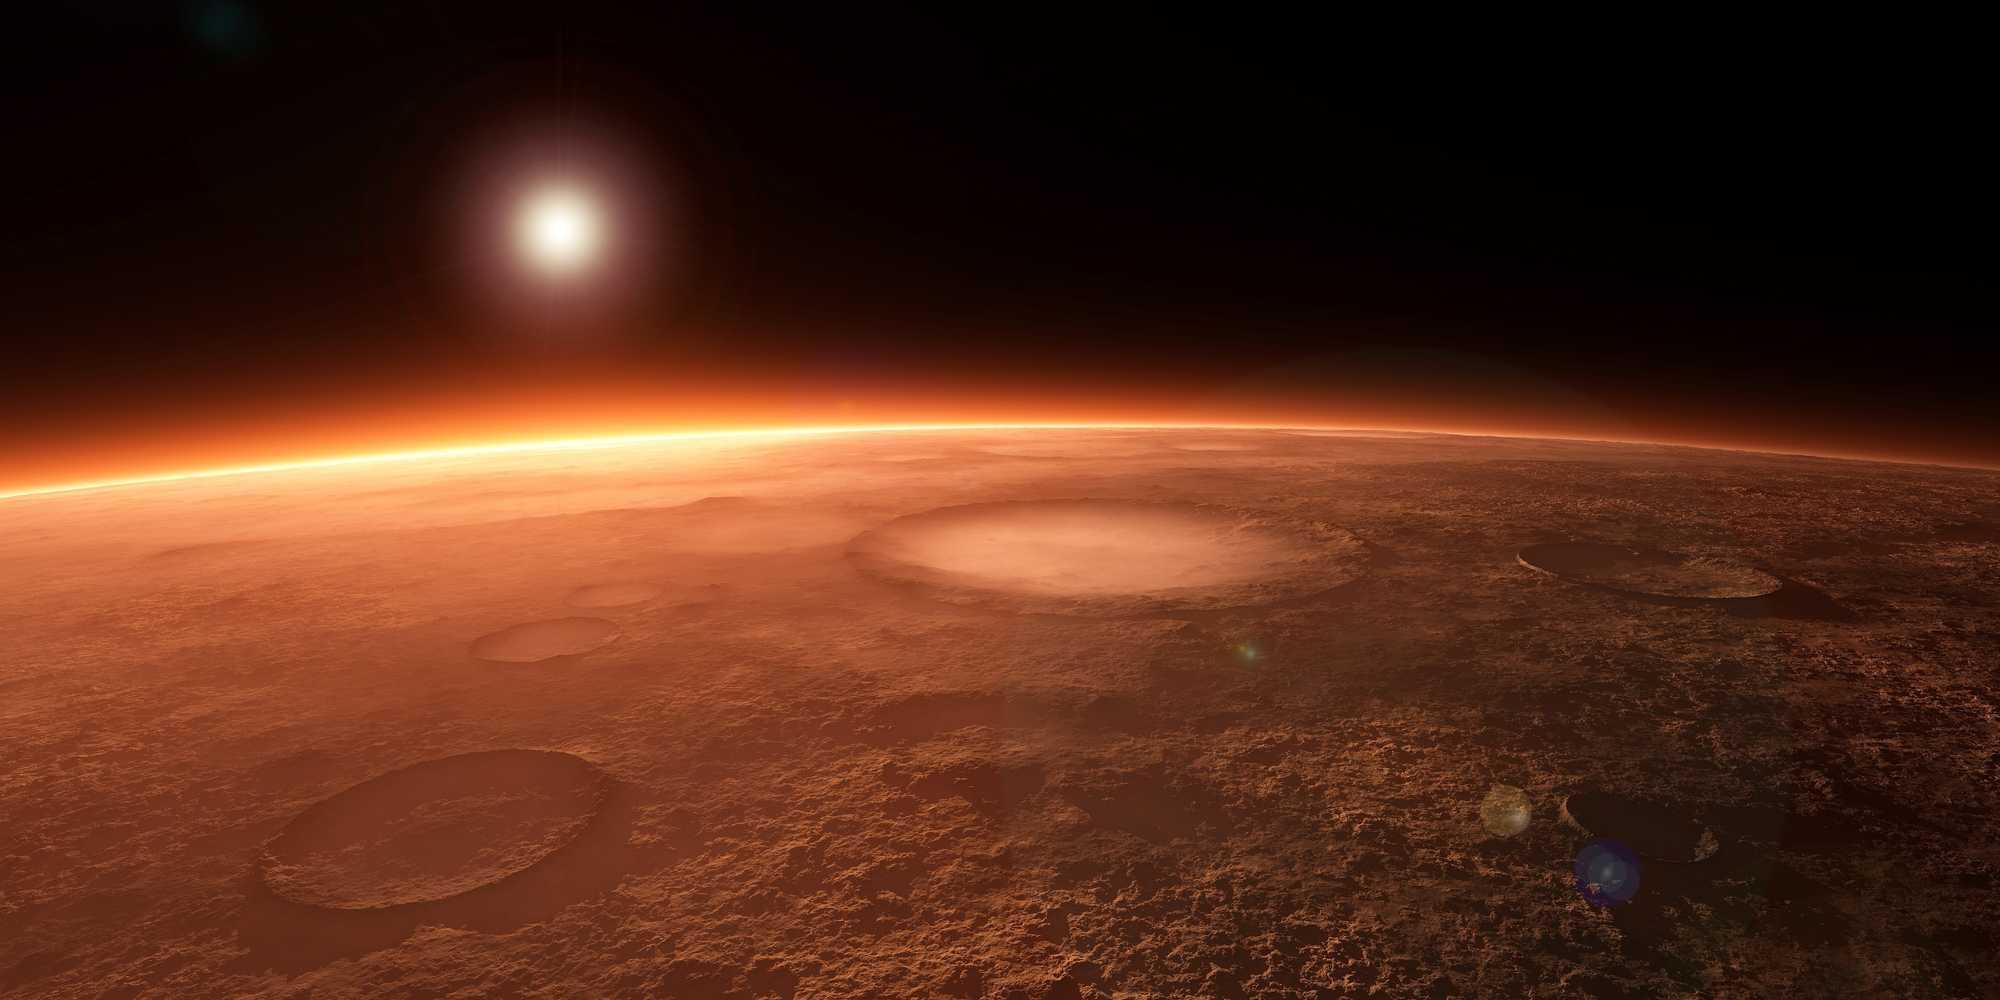 Mars from orbit